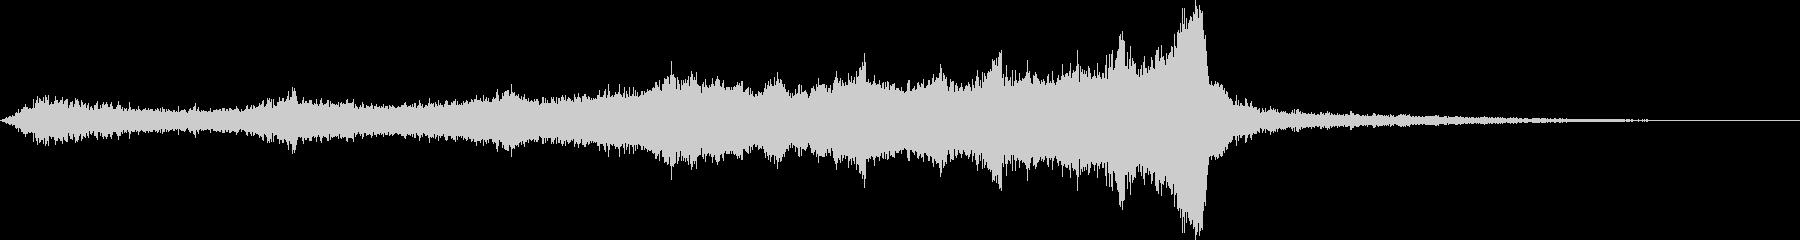 CINEMATIC RISER_14の未再生の波形